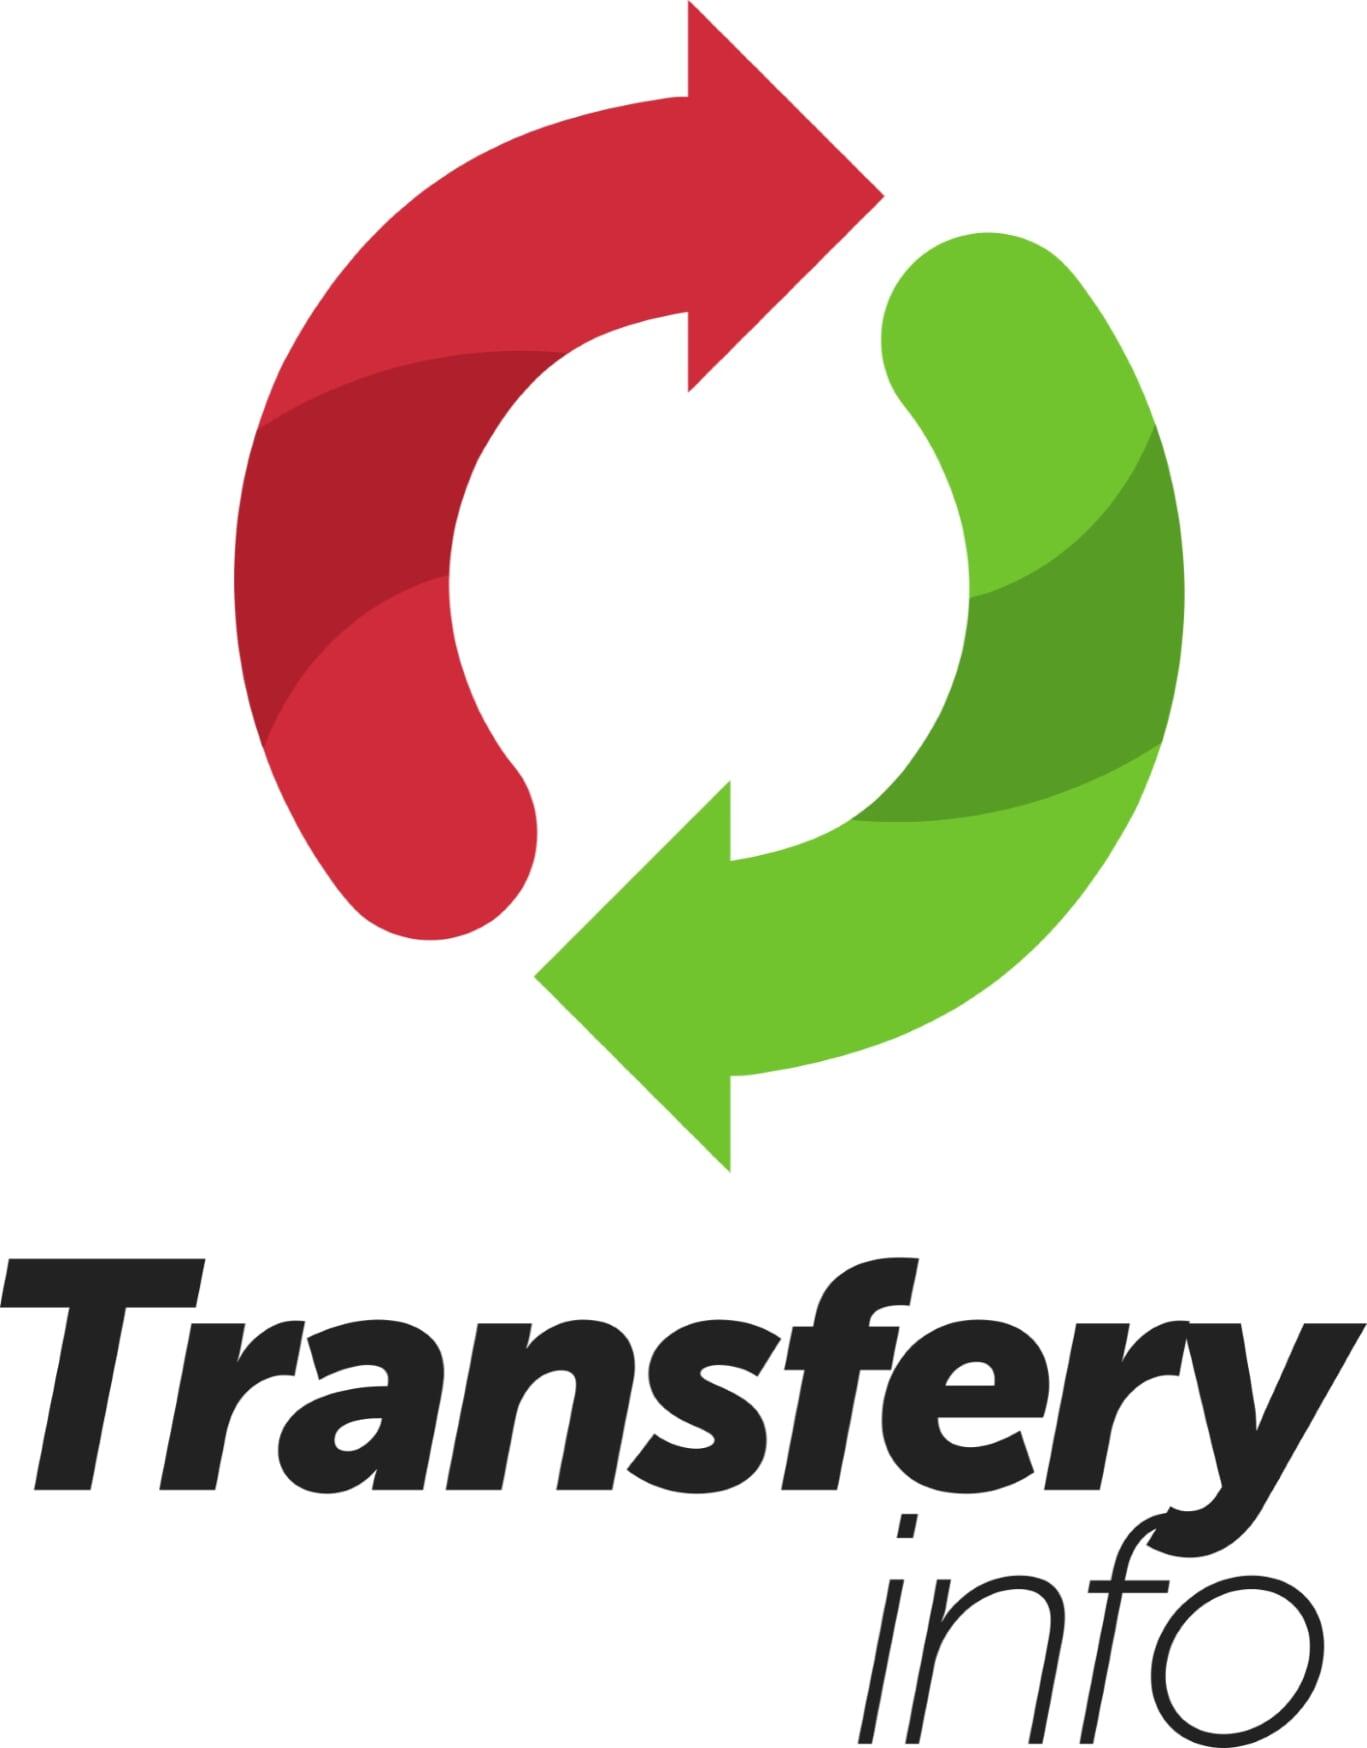 Transfery.info logo